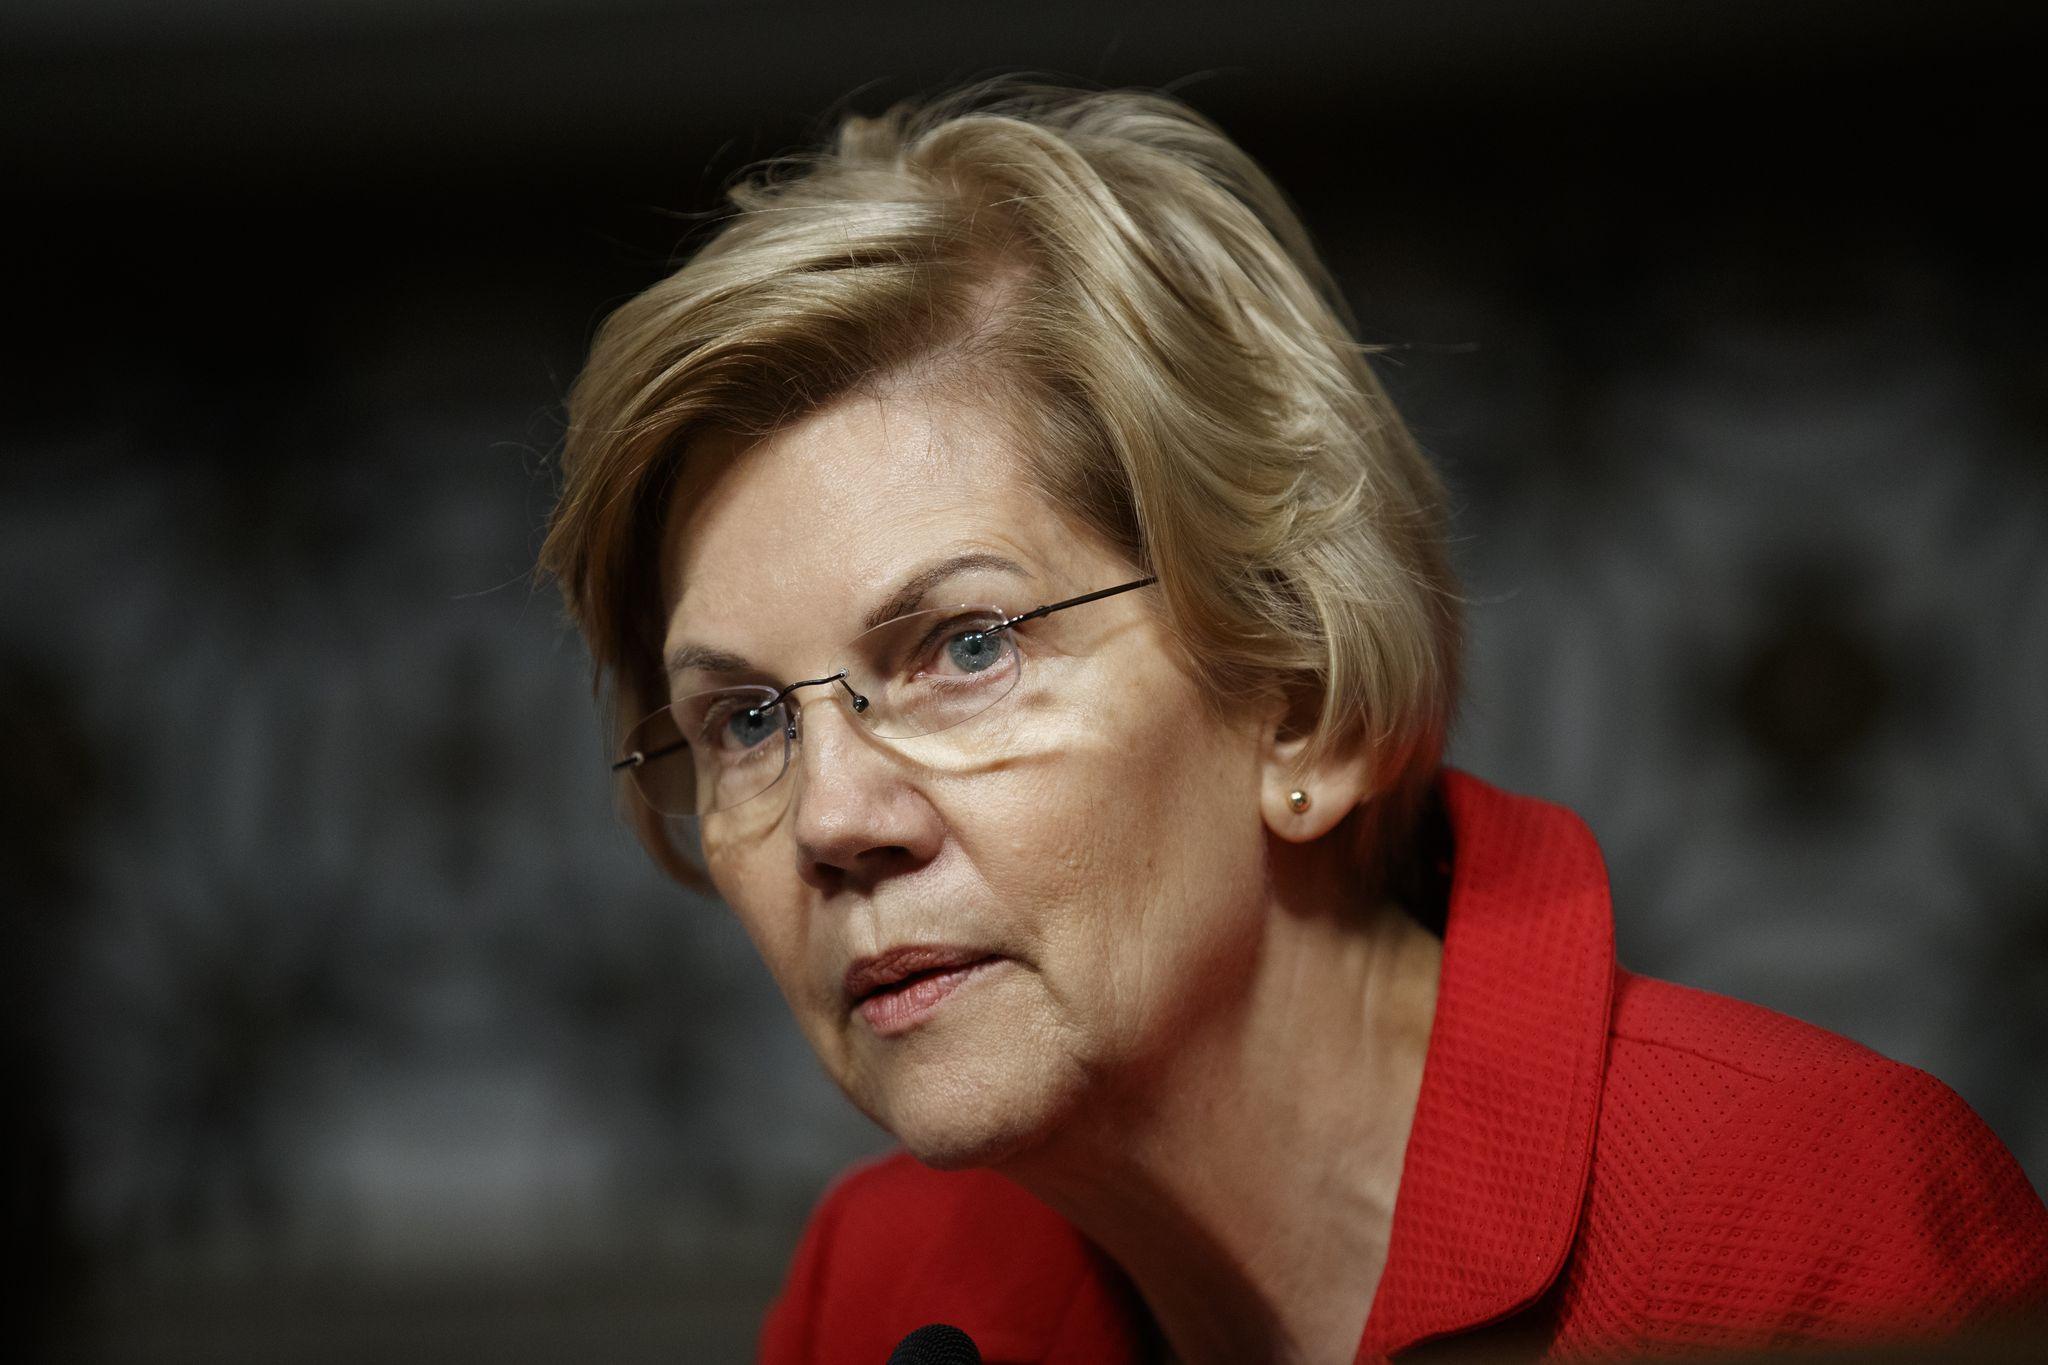 Sen. Elizabeth Warren: 'Just wrong' to label me a socialist